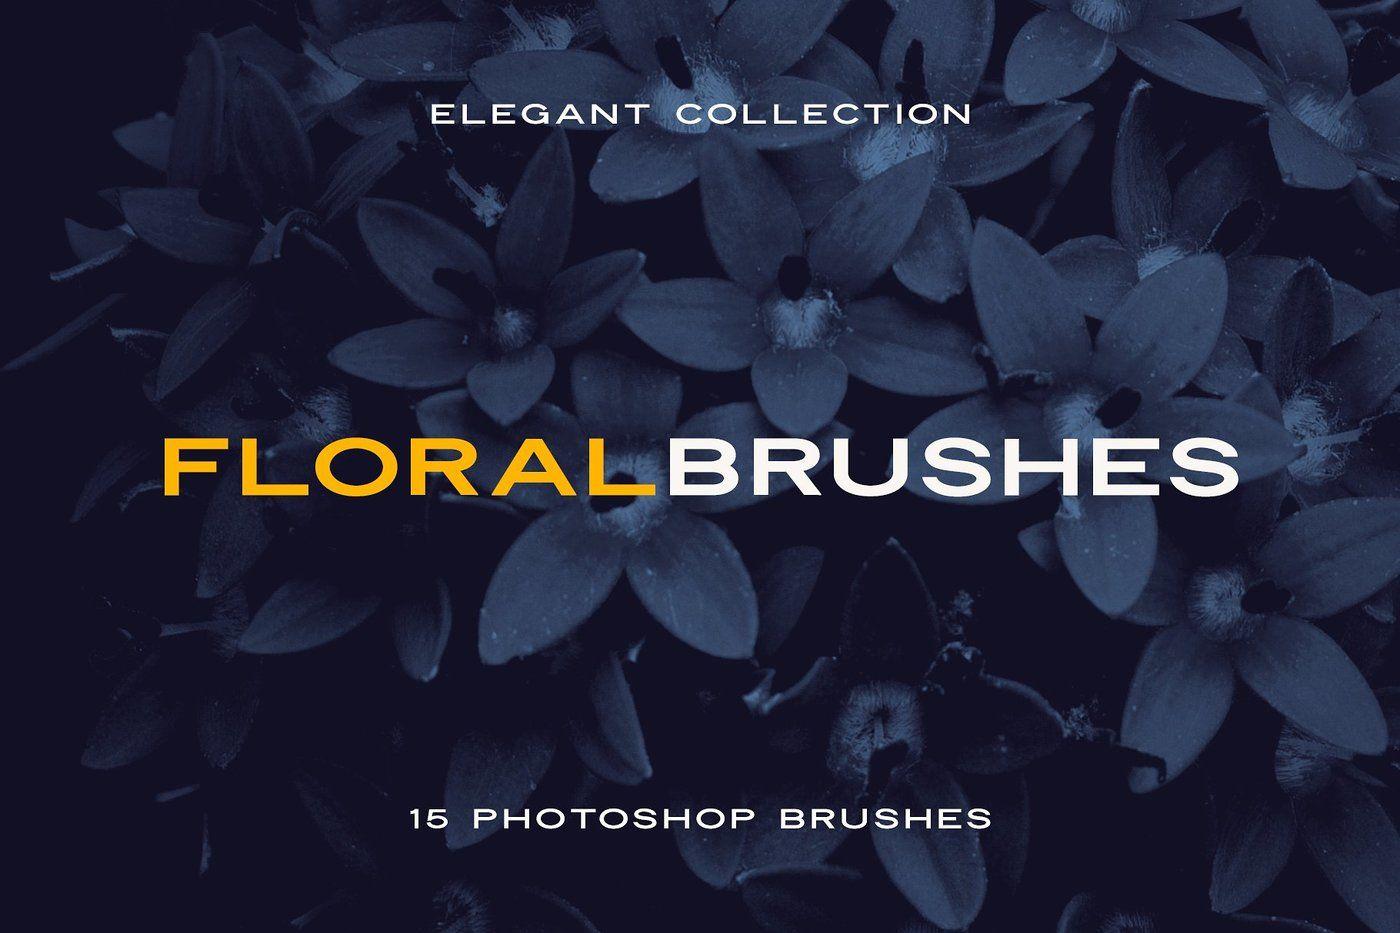 Elegant Floral Brushes for Photoshop By Milka